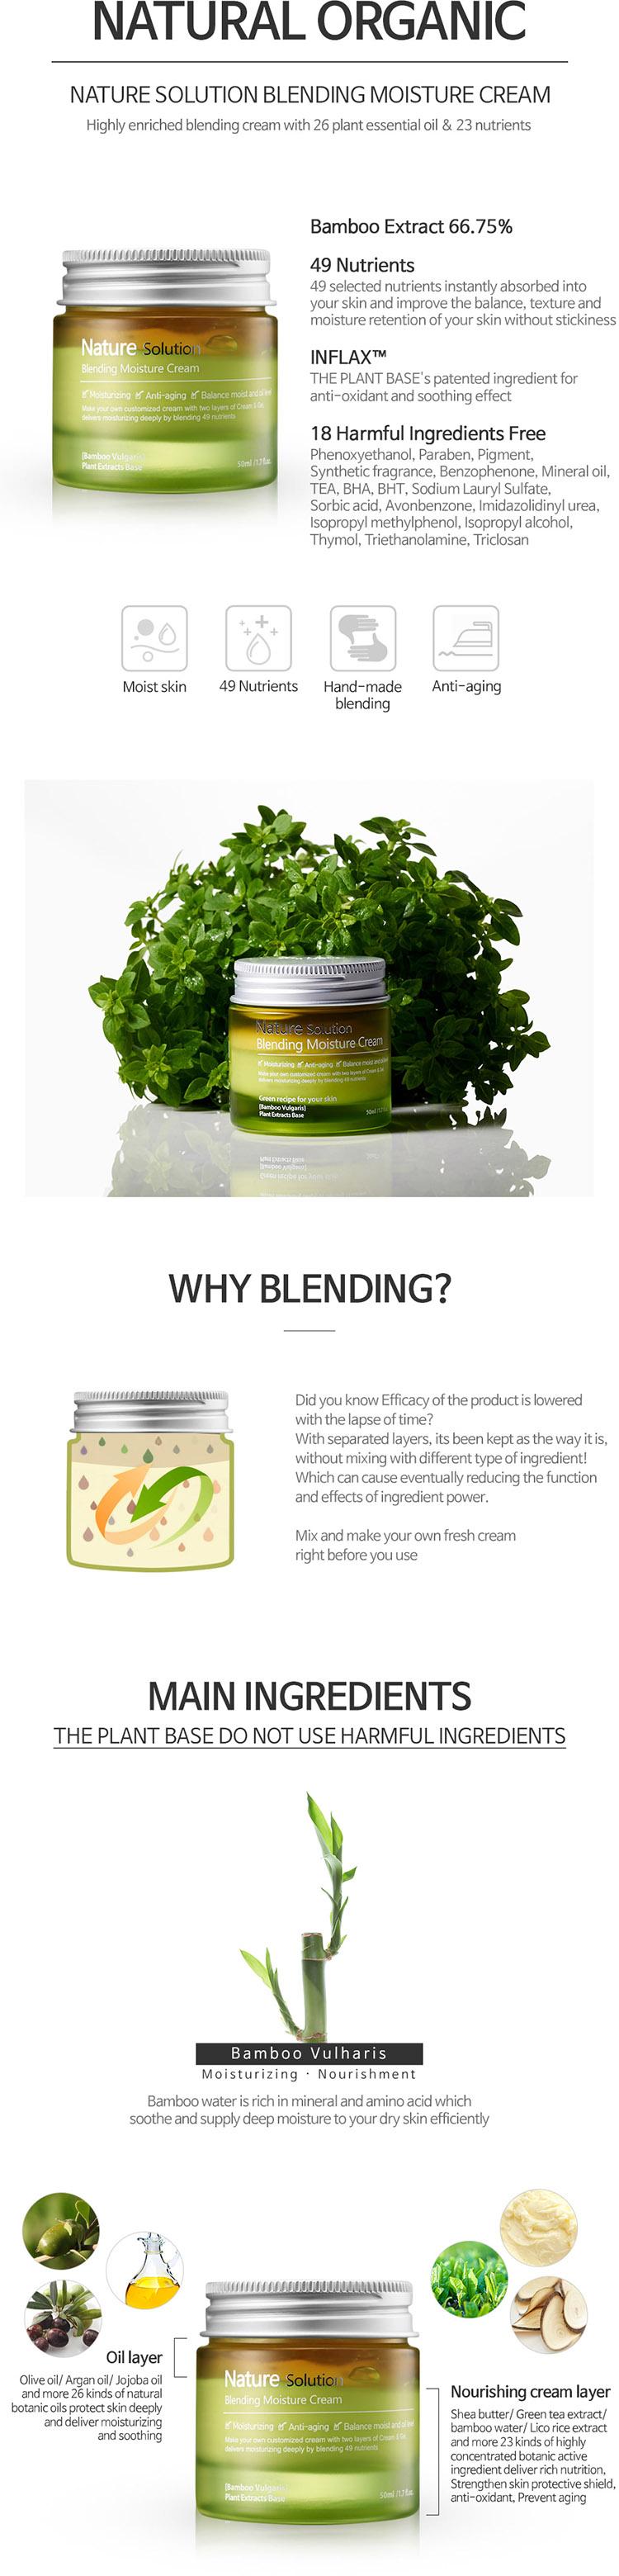 Kem Dưỡng Ẩm Và Làm Mềm Da Nature Solution Blending Moisture Cream